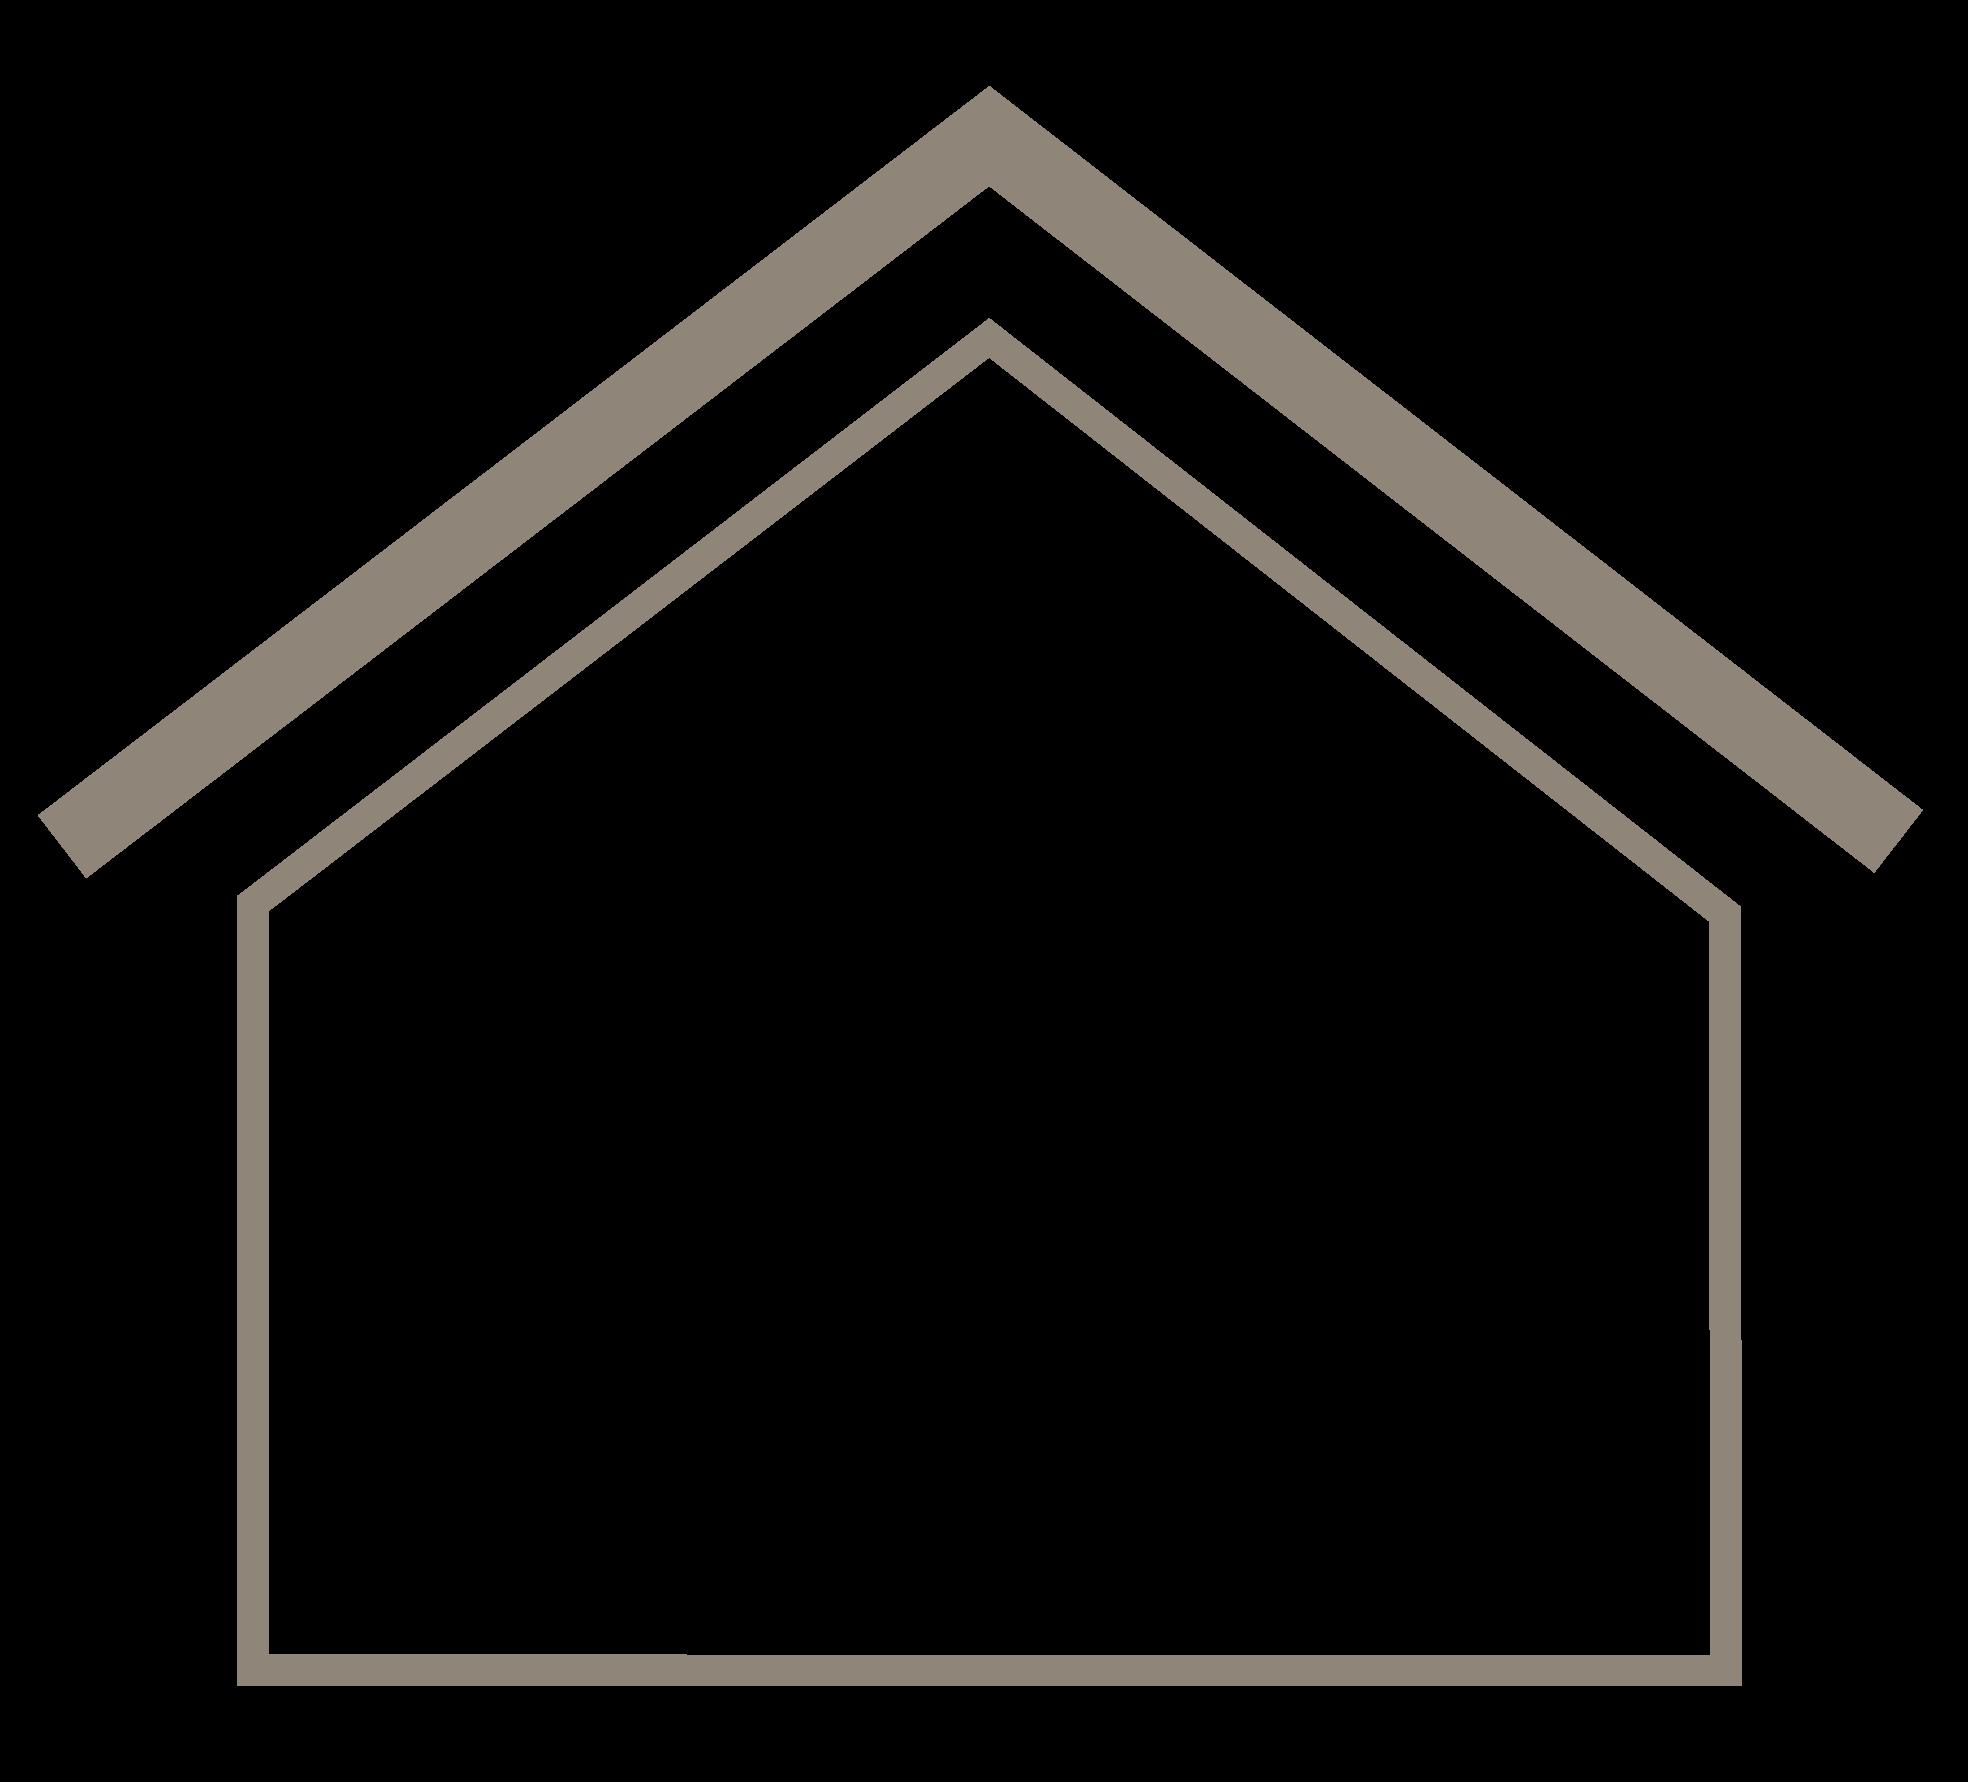 Icon Haus